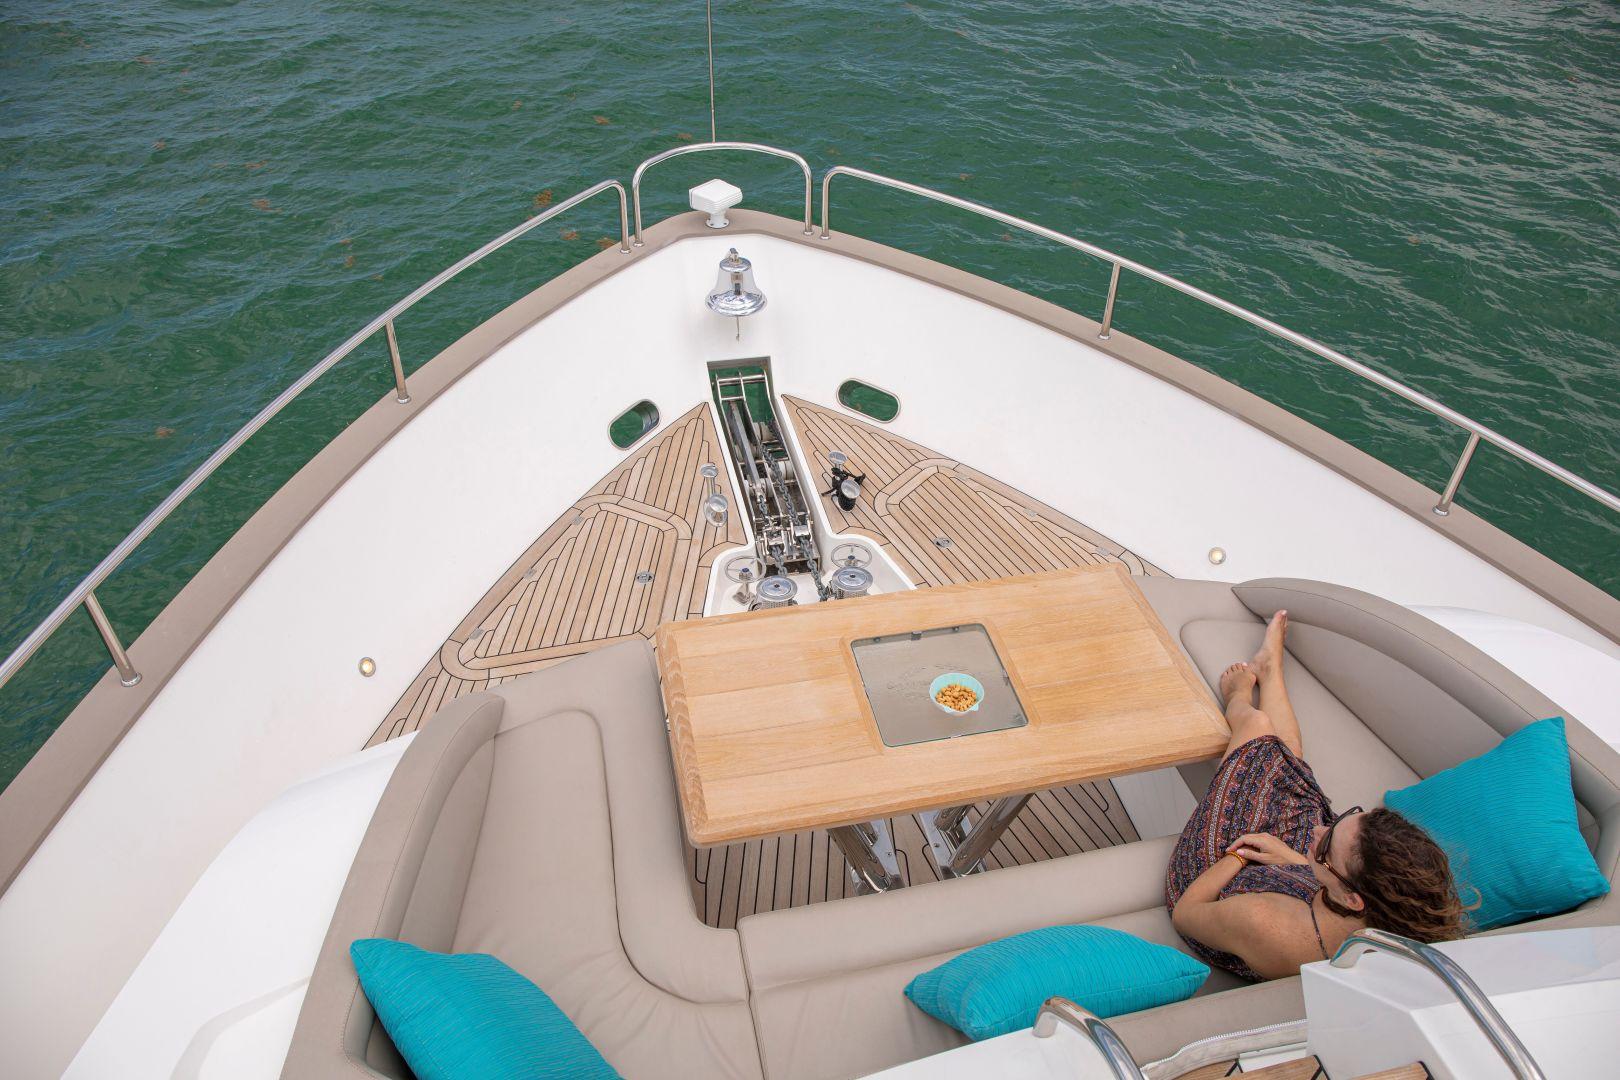 Sunseeker-95 Yacht 2017-Perseverance 3 Ft Lauderdale-Florida-United States-1400115   Thumbnail